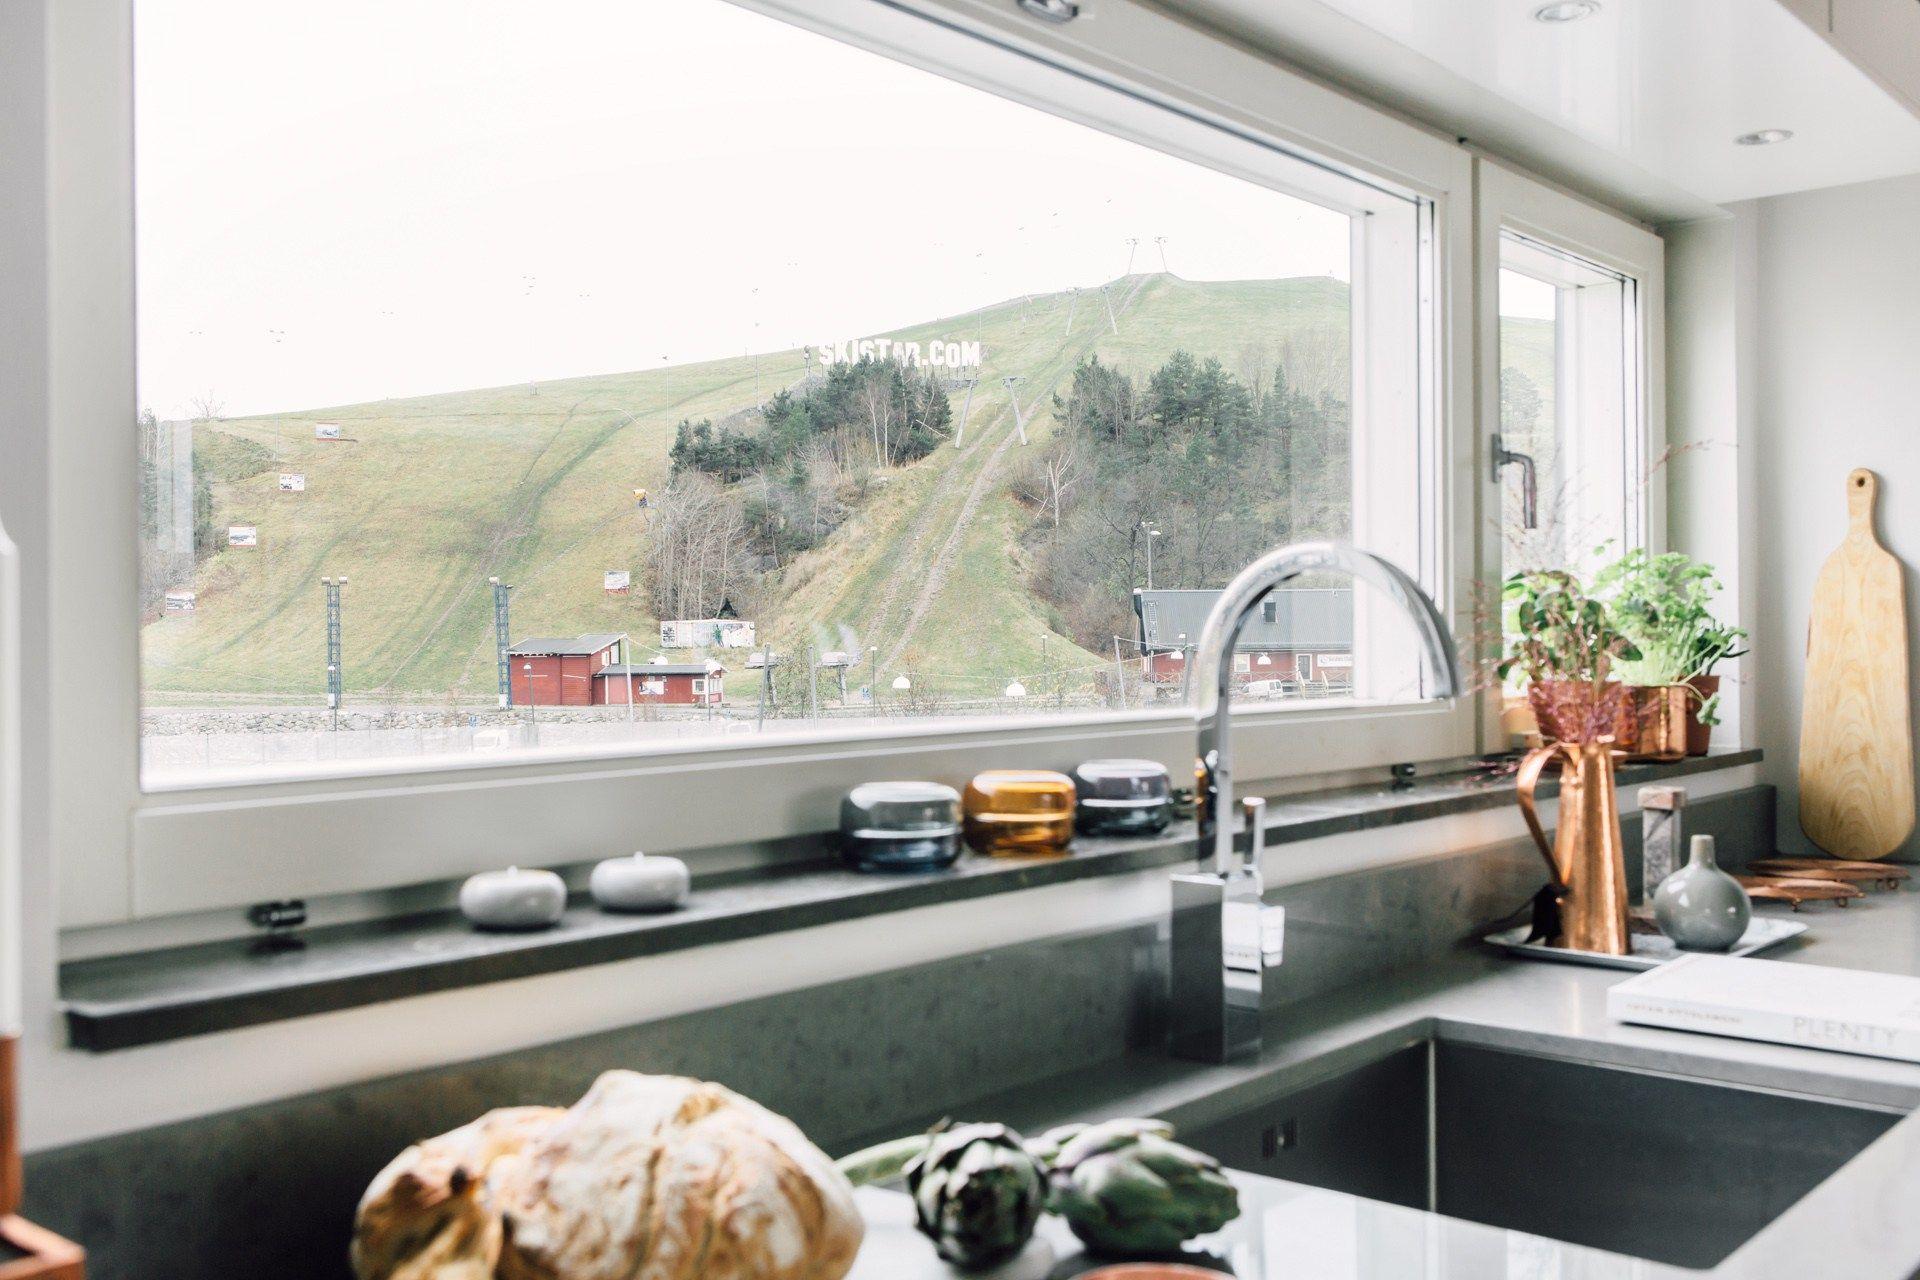 Cocina abierta al salón con vistas | Cocinas blancas modernas ...